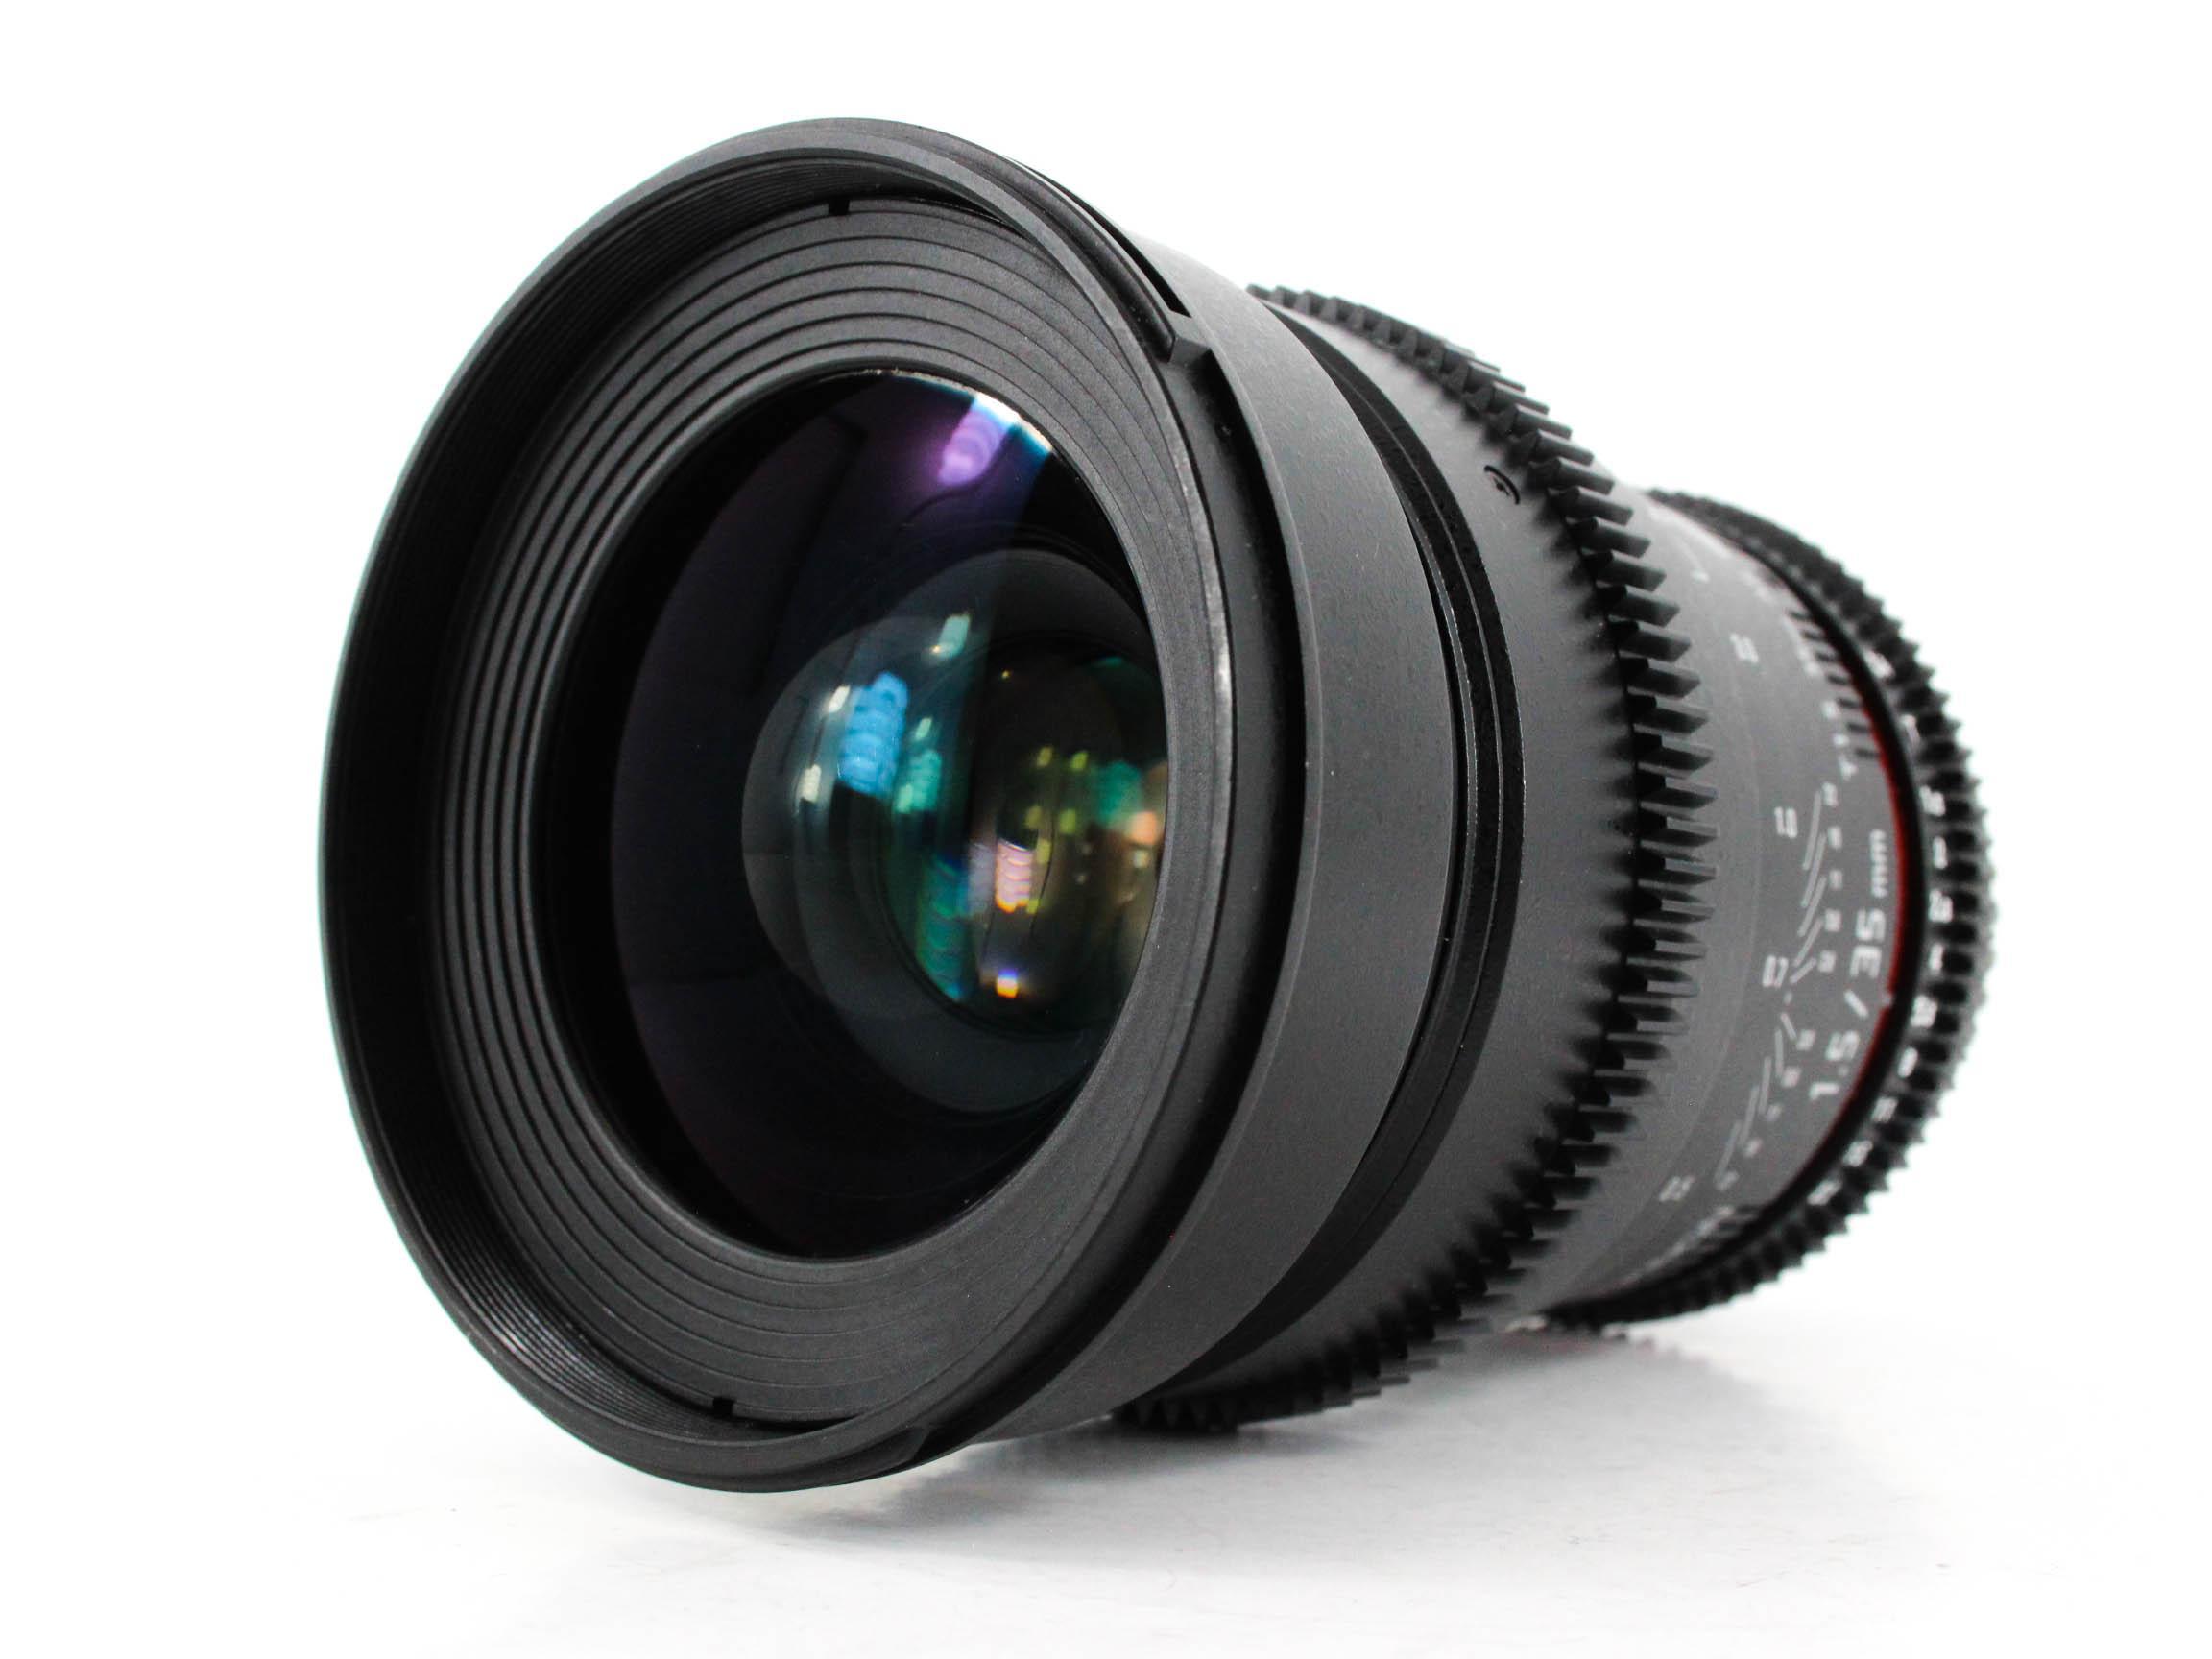 rokinon35mmf1.5 image